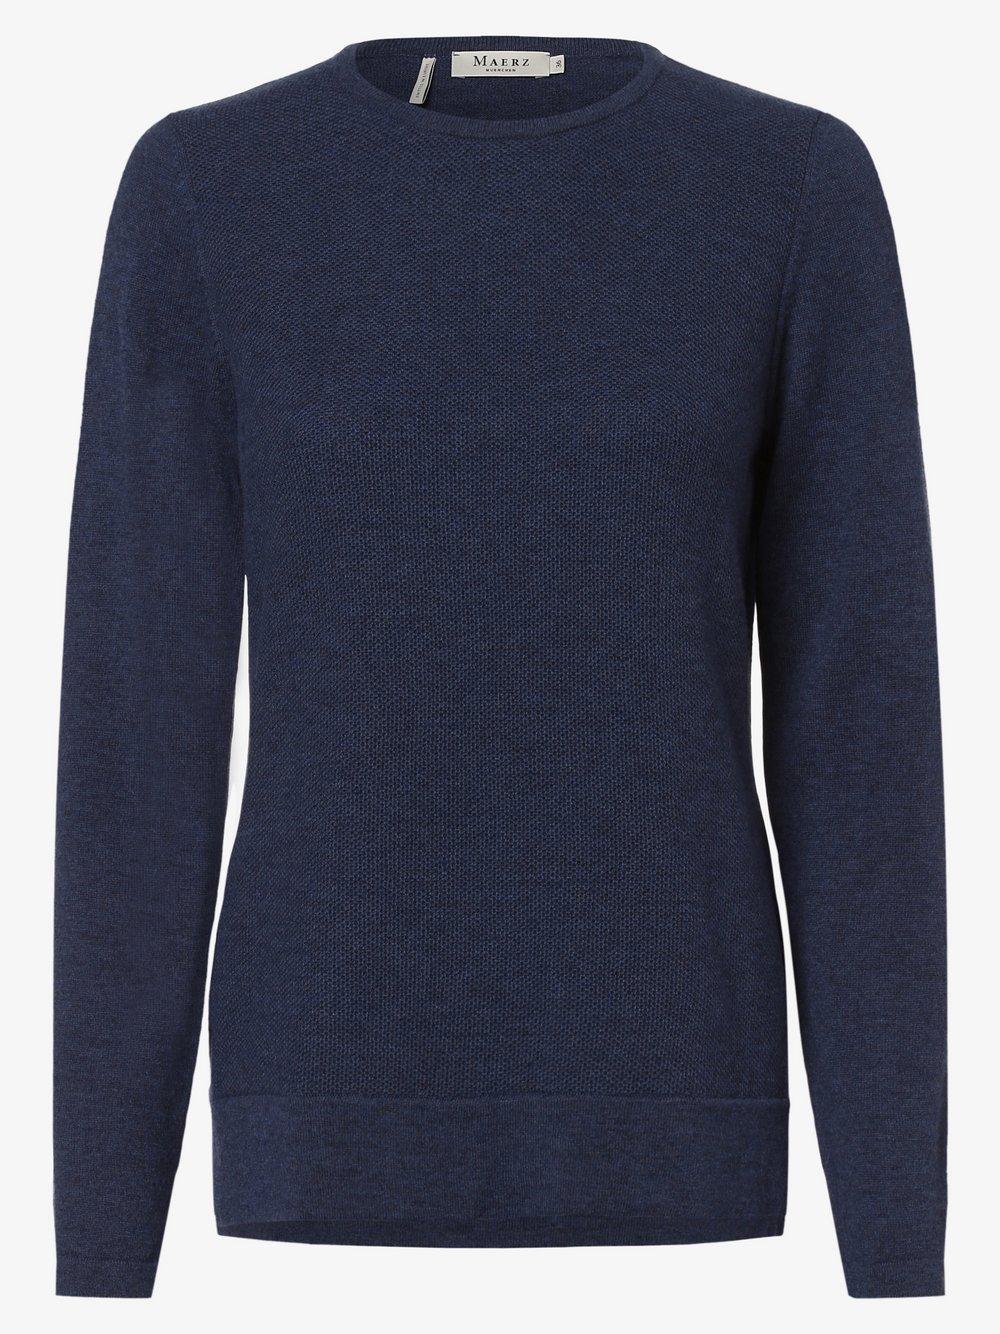 März – Sweter damski, niebieski Van Graaf 449349-0003-00380